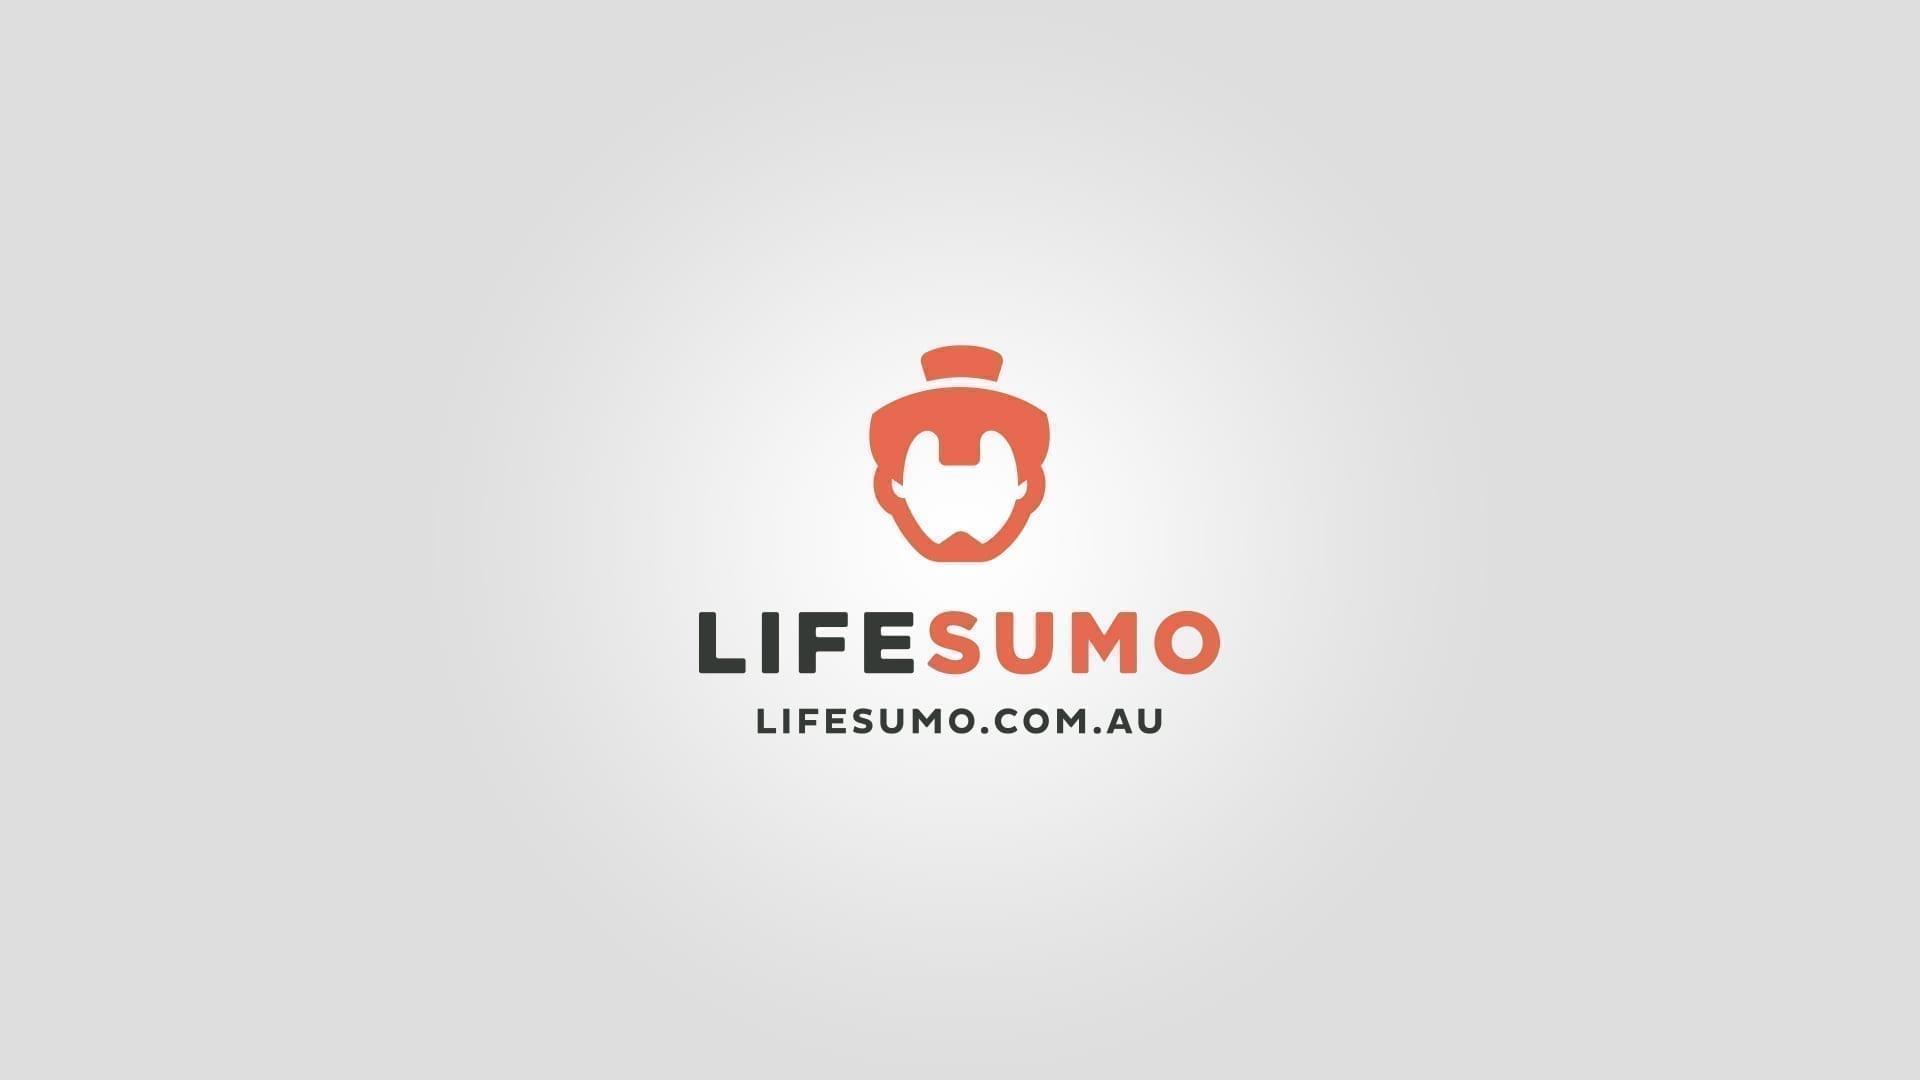 Life Sumo